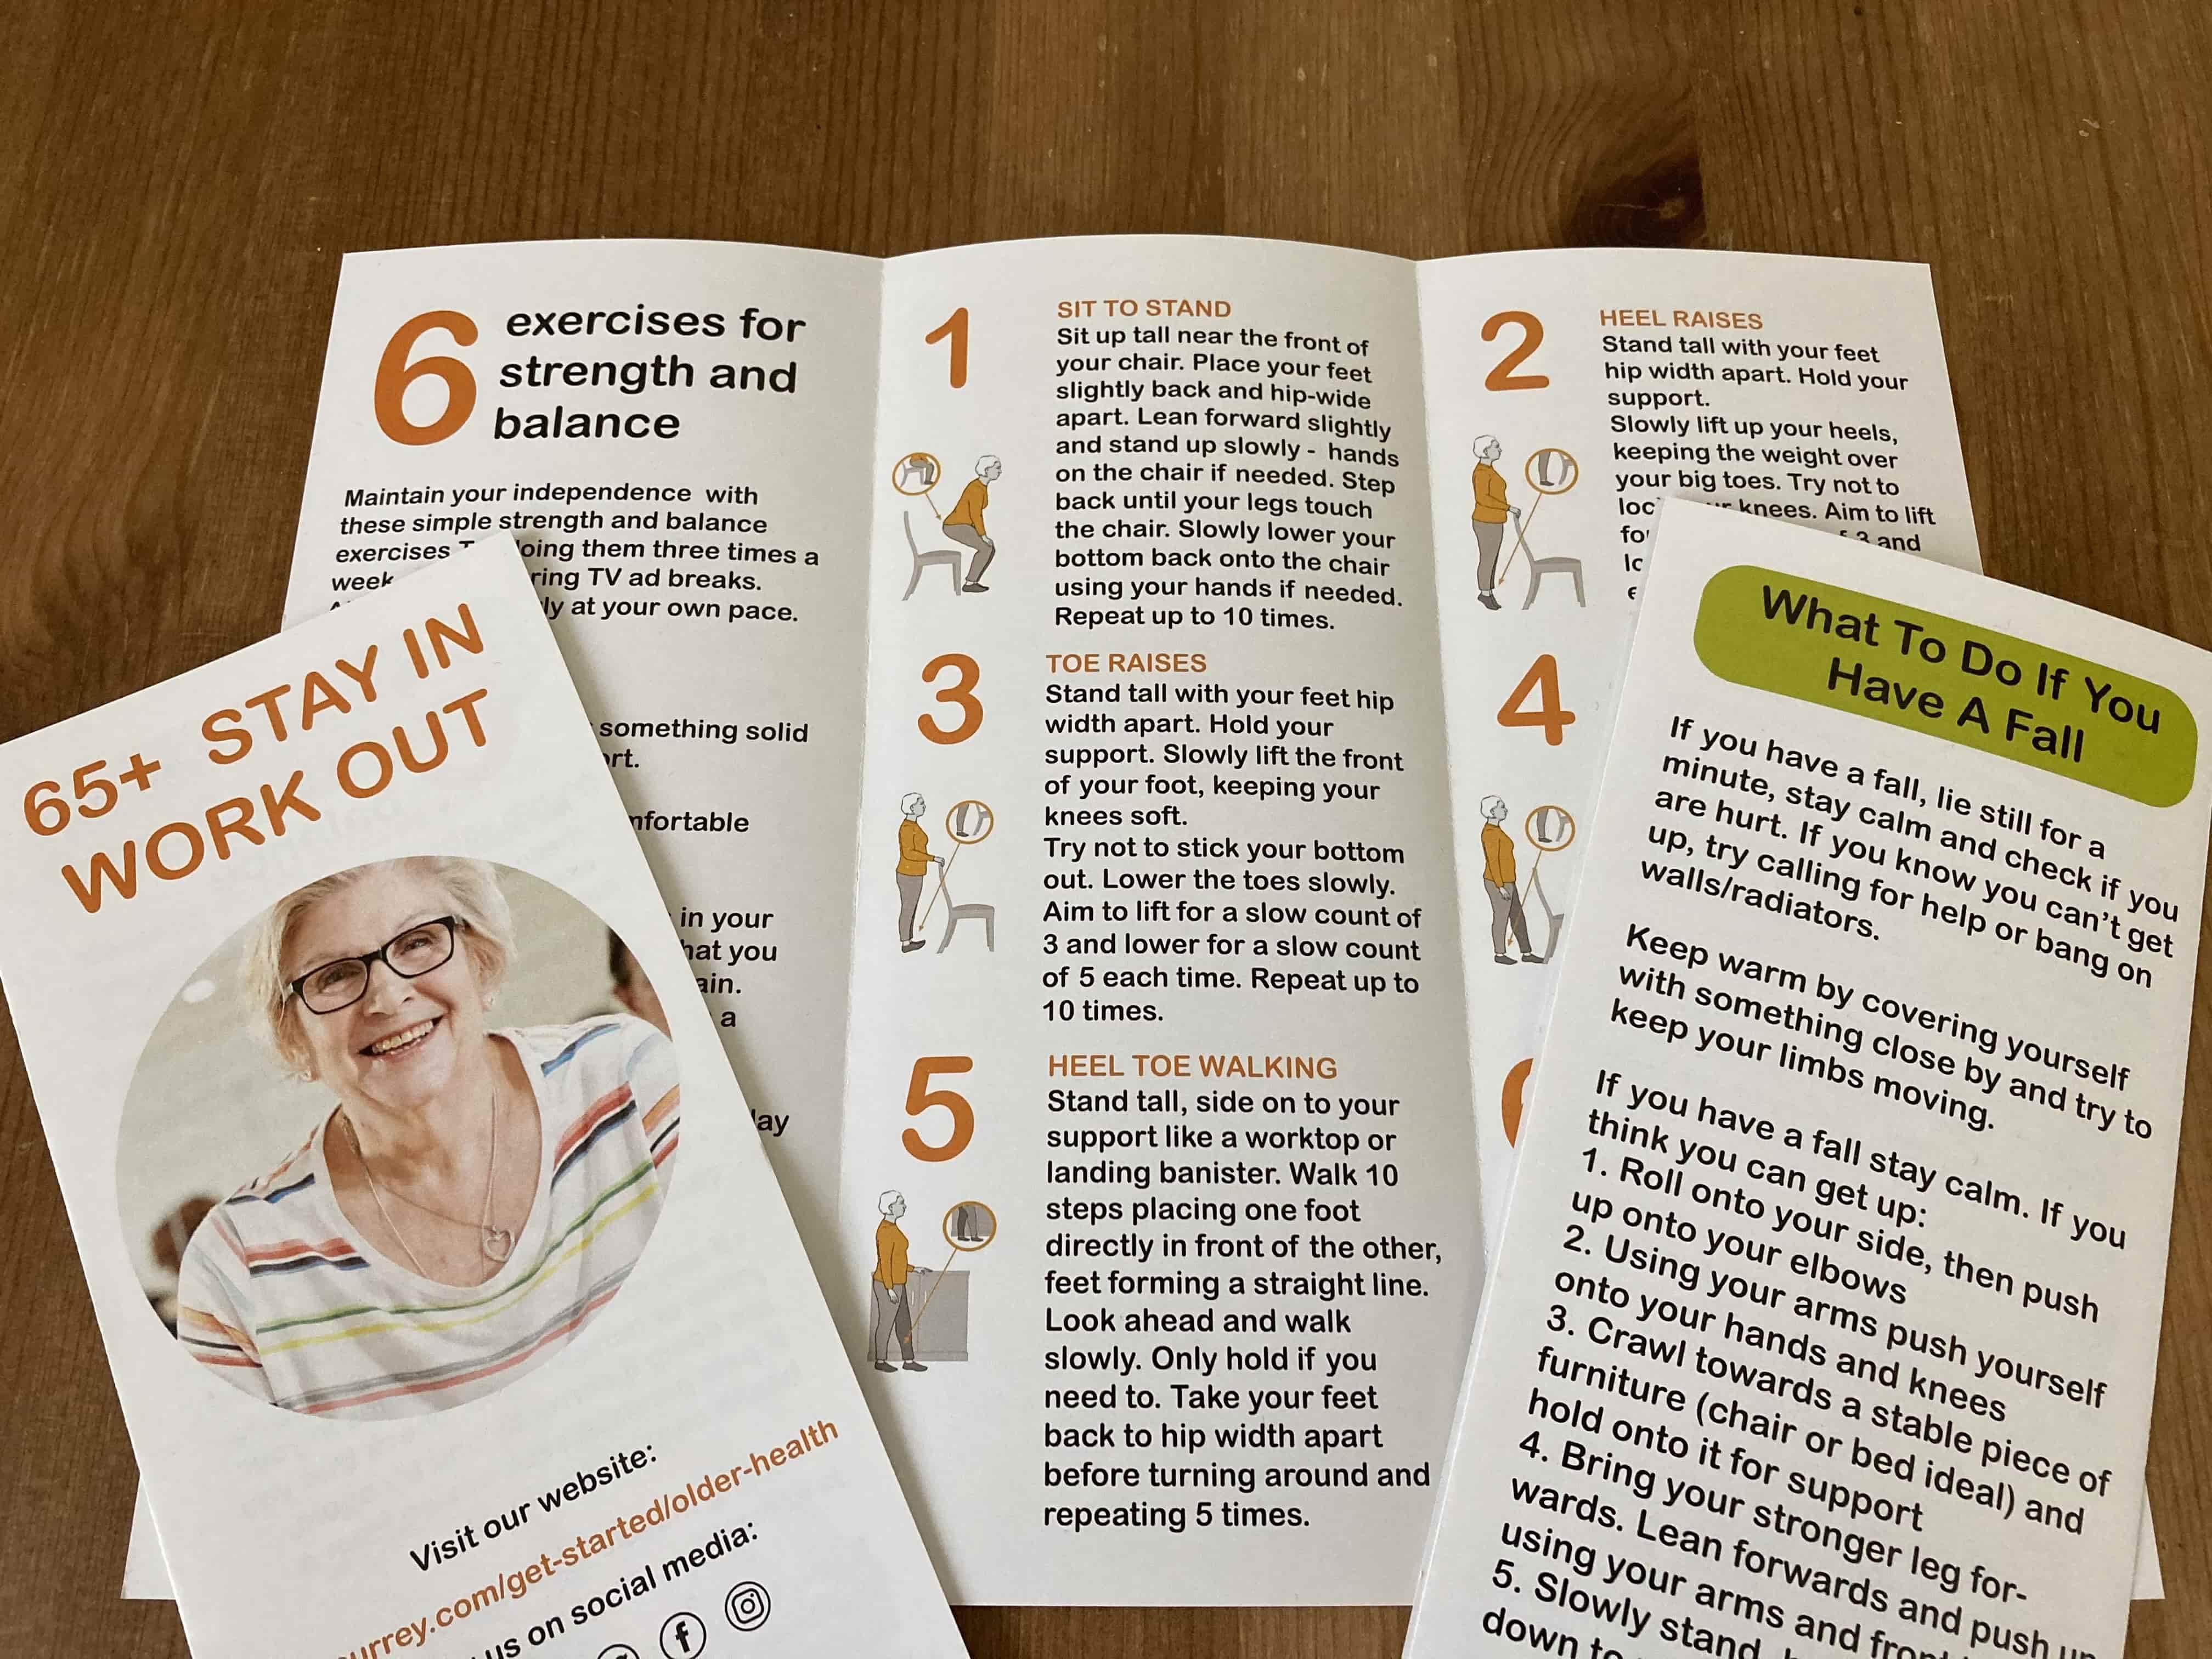 falls prevention leaflet